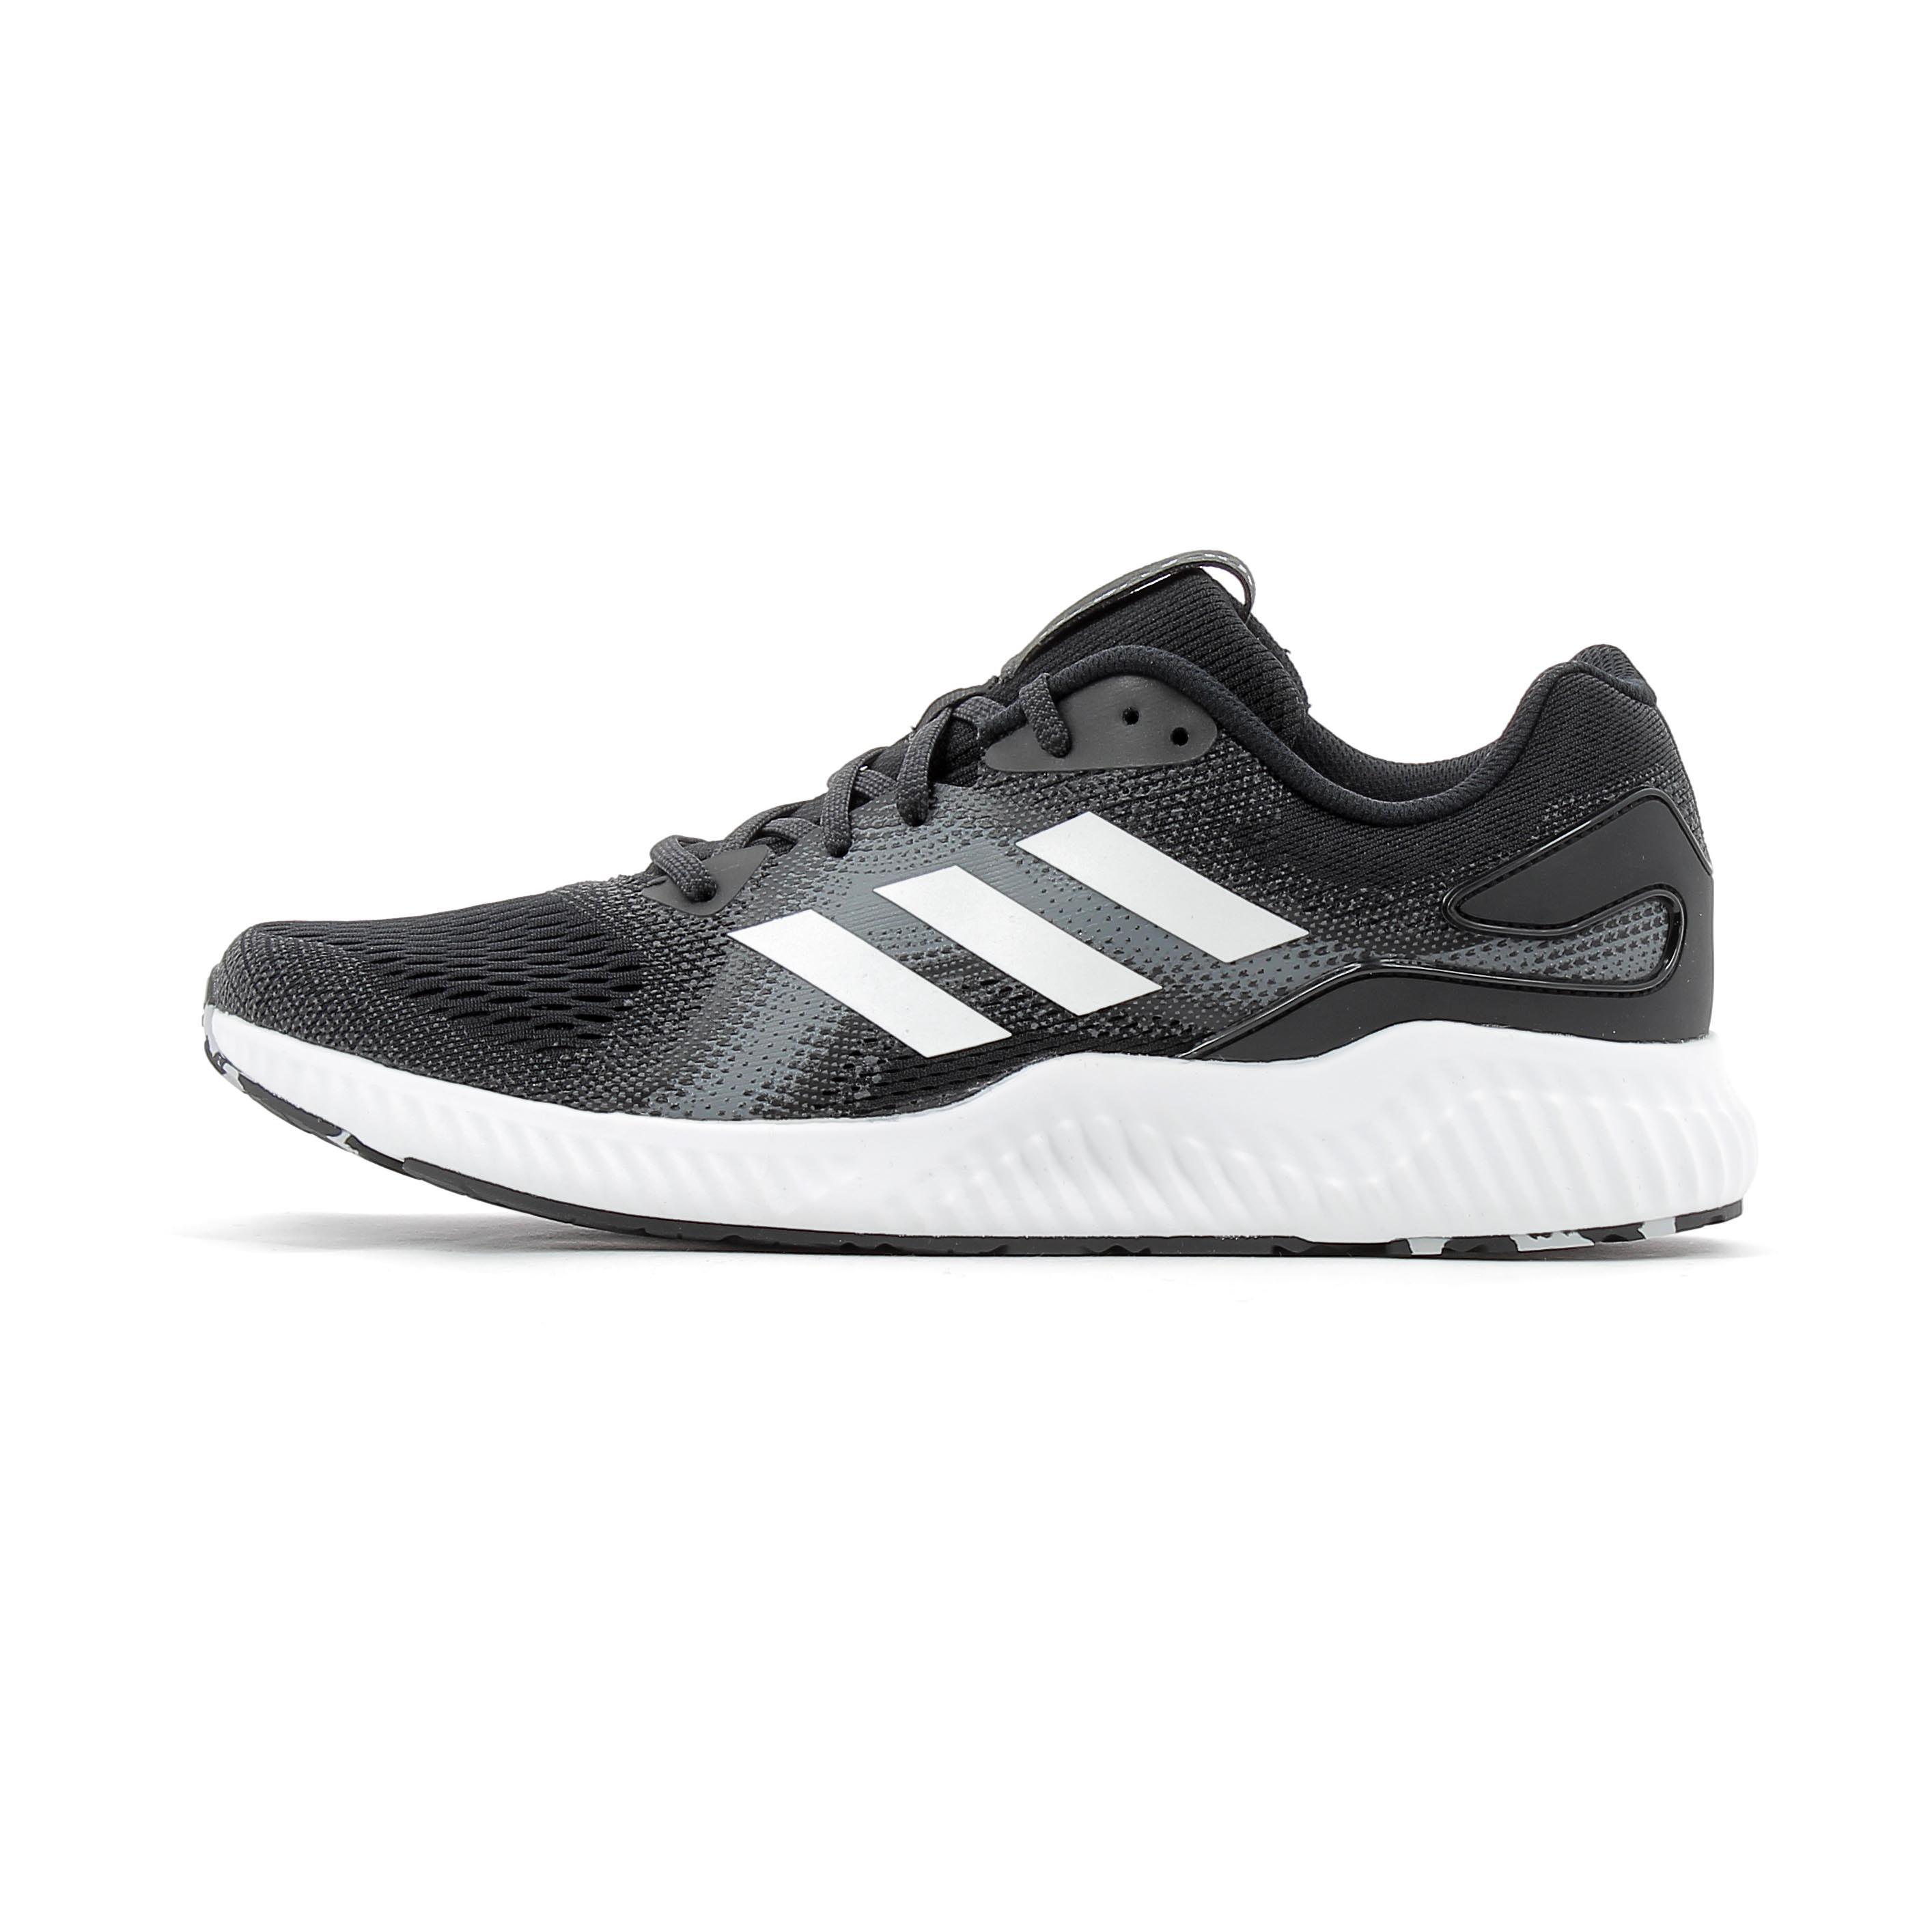 premium selection 8b30f 5059a Chaussures de running Adidas Performance AeroBounce St